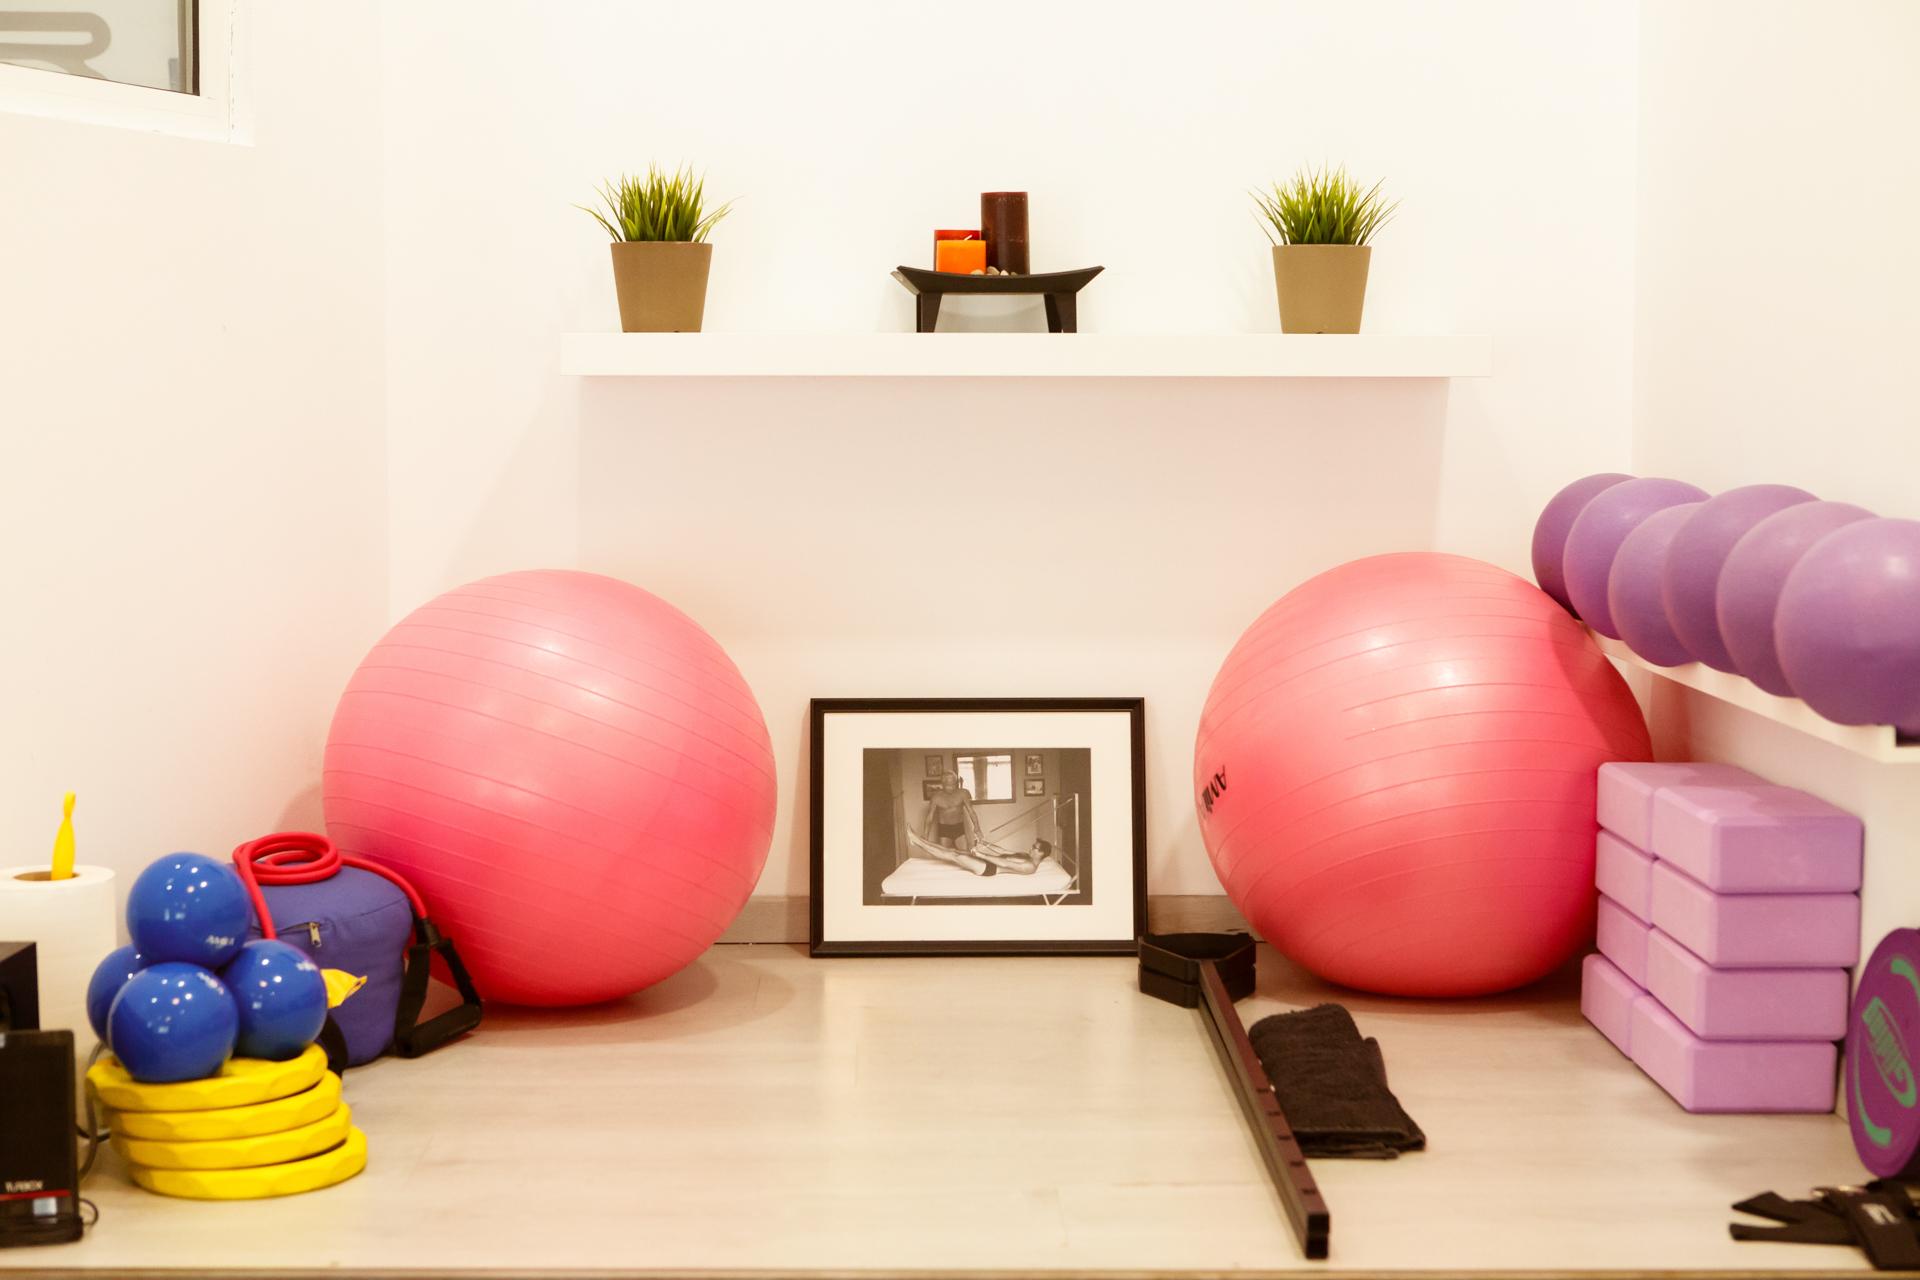 Laskaratou Elixir Gym & Pilates Studio Schedule